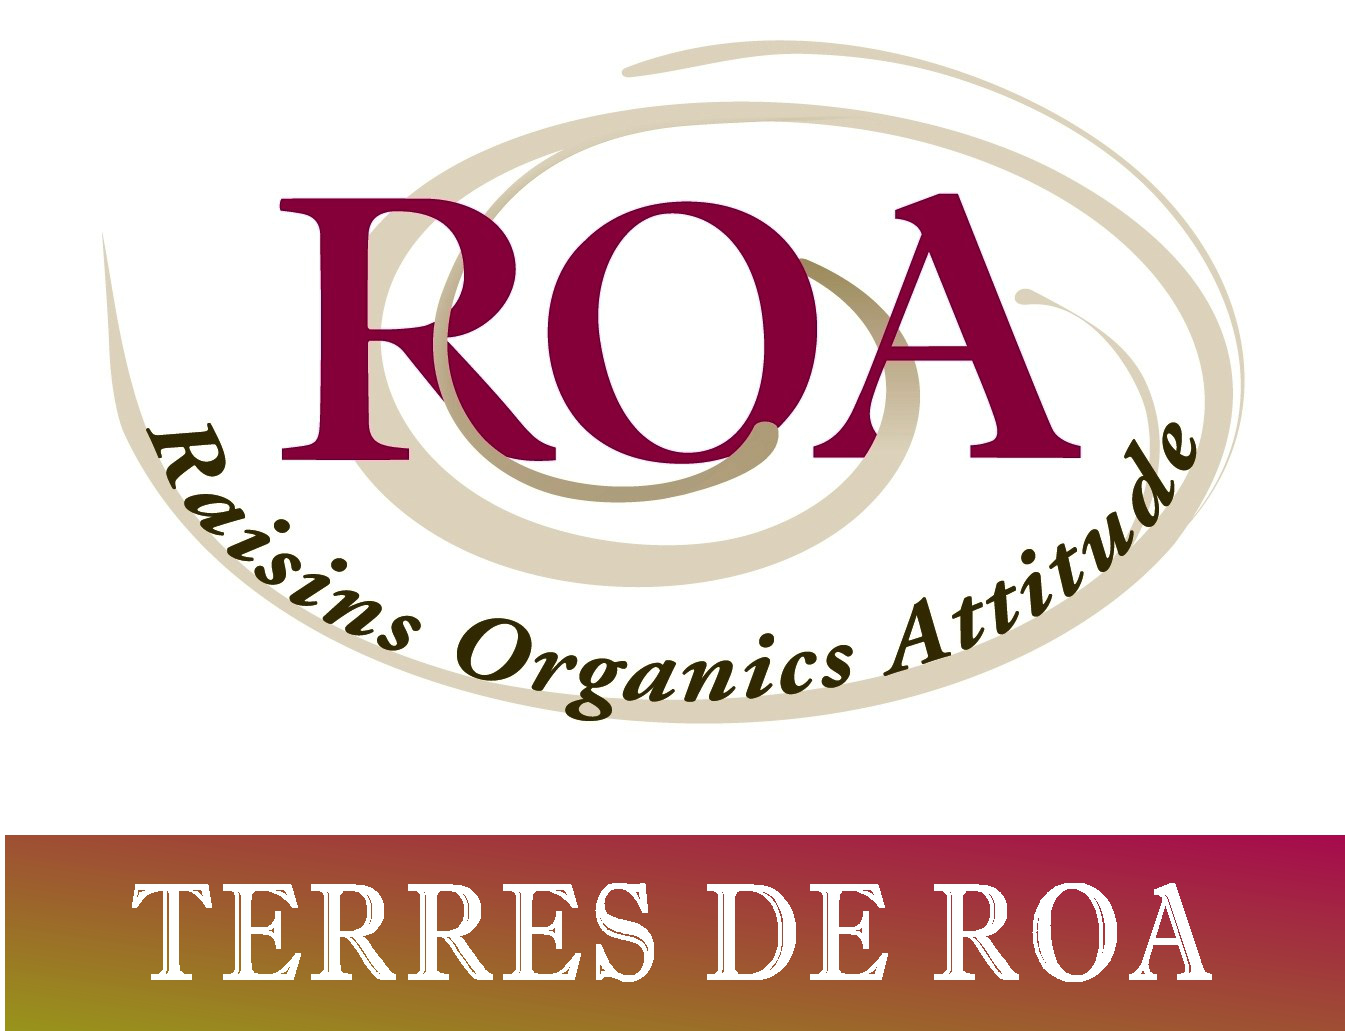 Terres de Roa